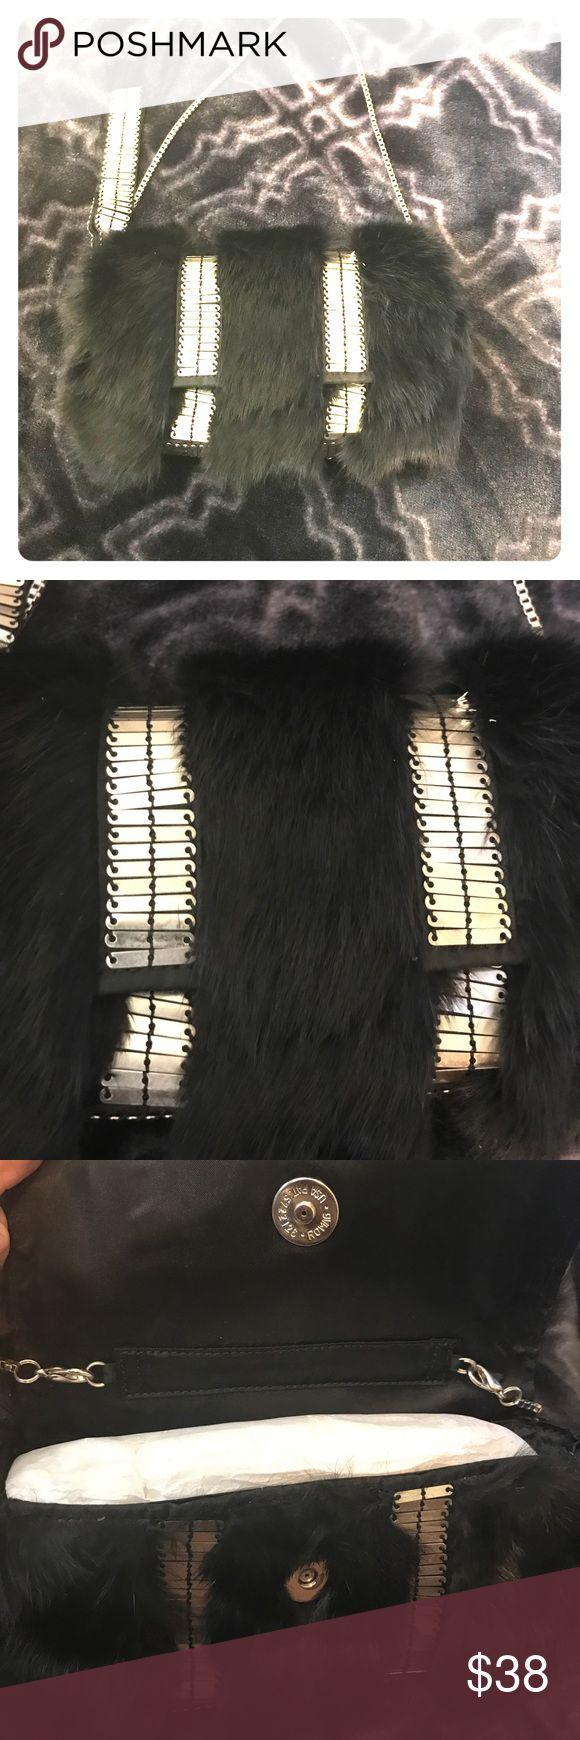 Armani Exchange purse Cute small black furry Armani Exchange purse. Can be worn on the wrist or on the shoulder Armani Exchange Bags Clutches & Wristlets